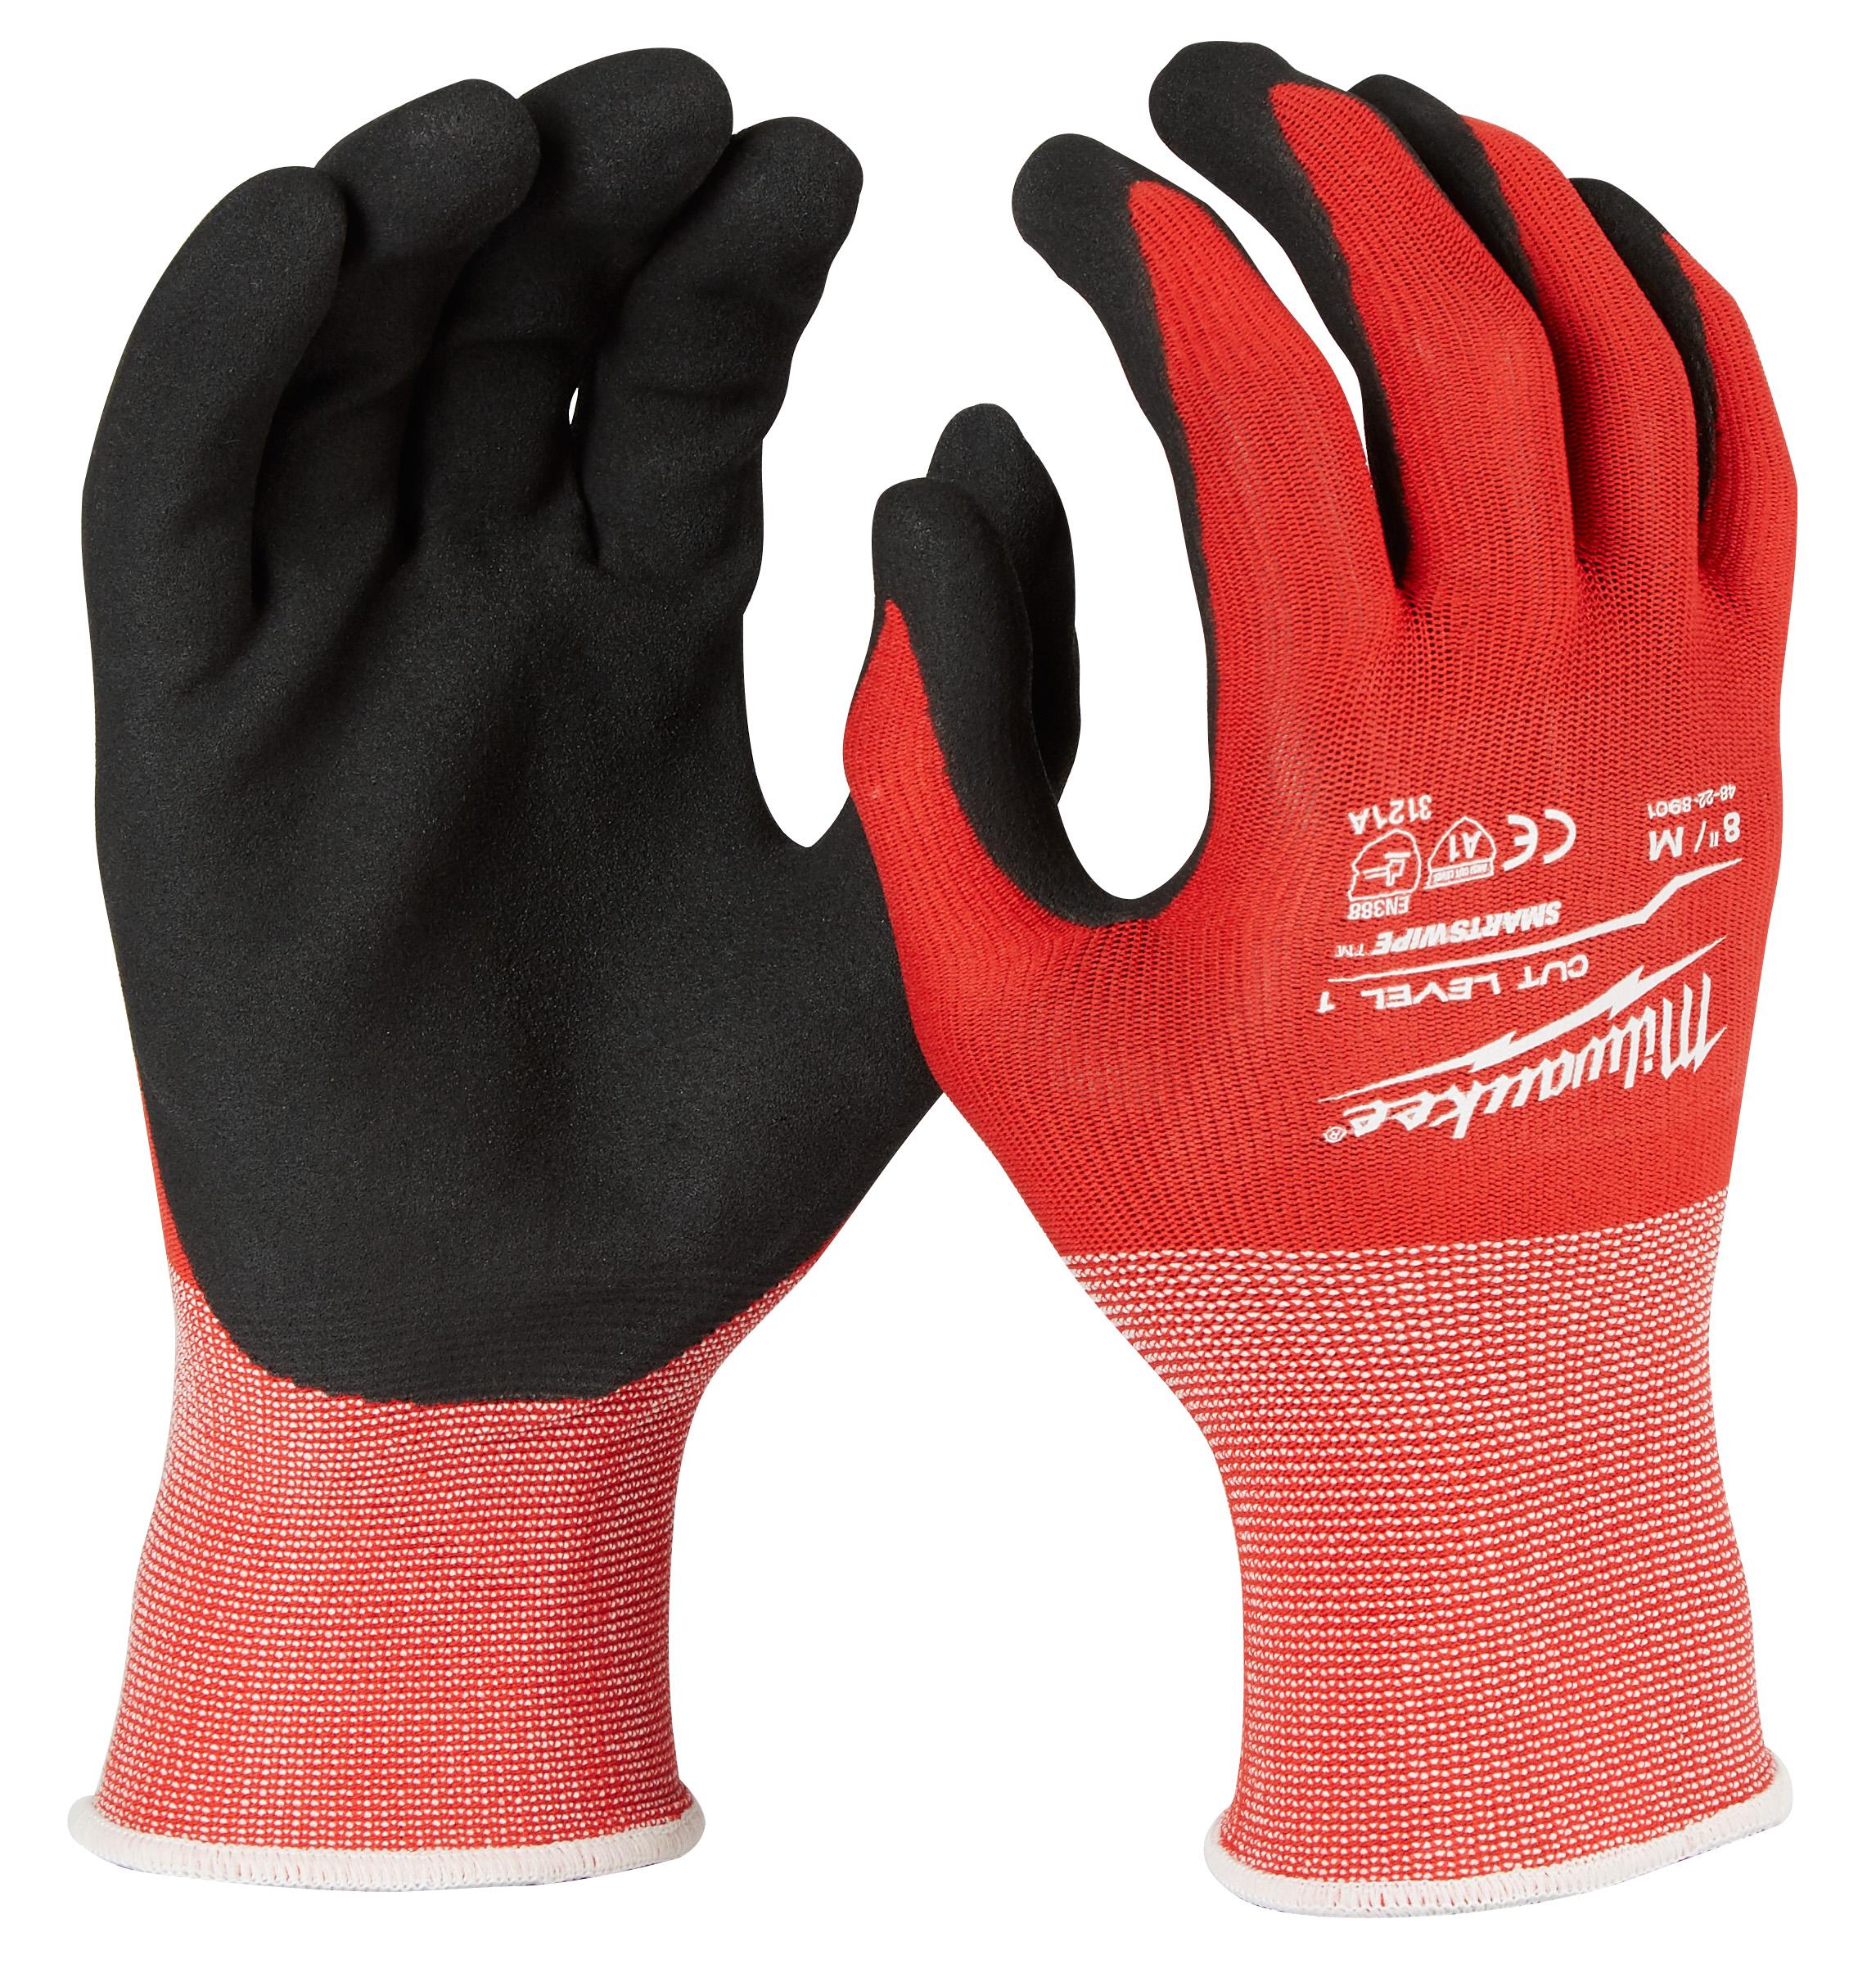 Milwaukee 48-22-8901 Cut 1 Dipped Gloves - M